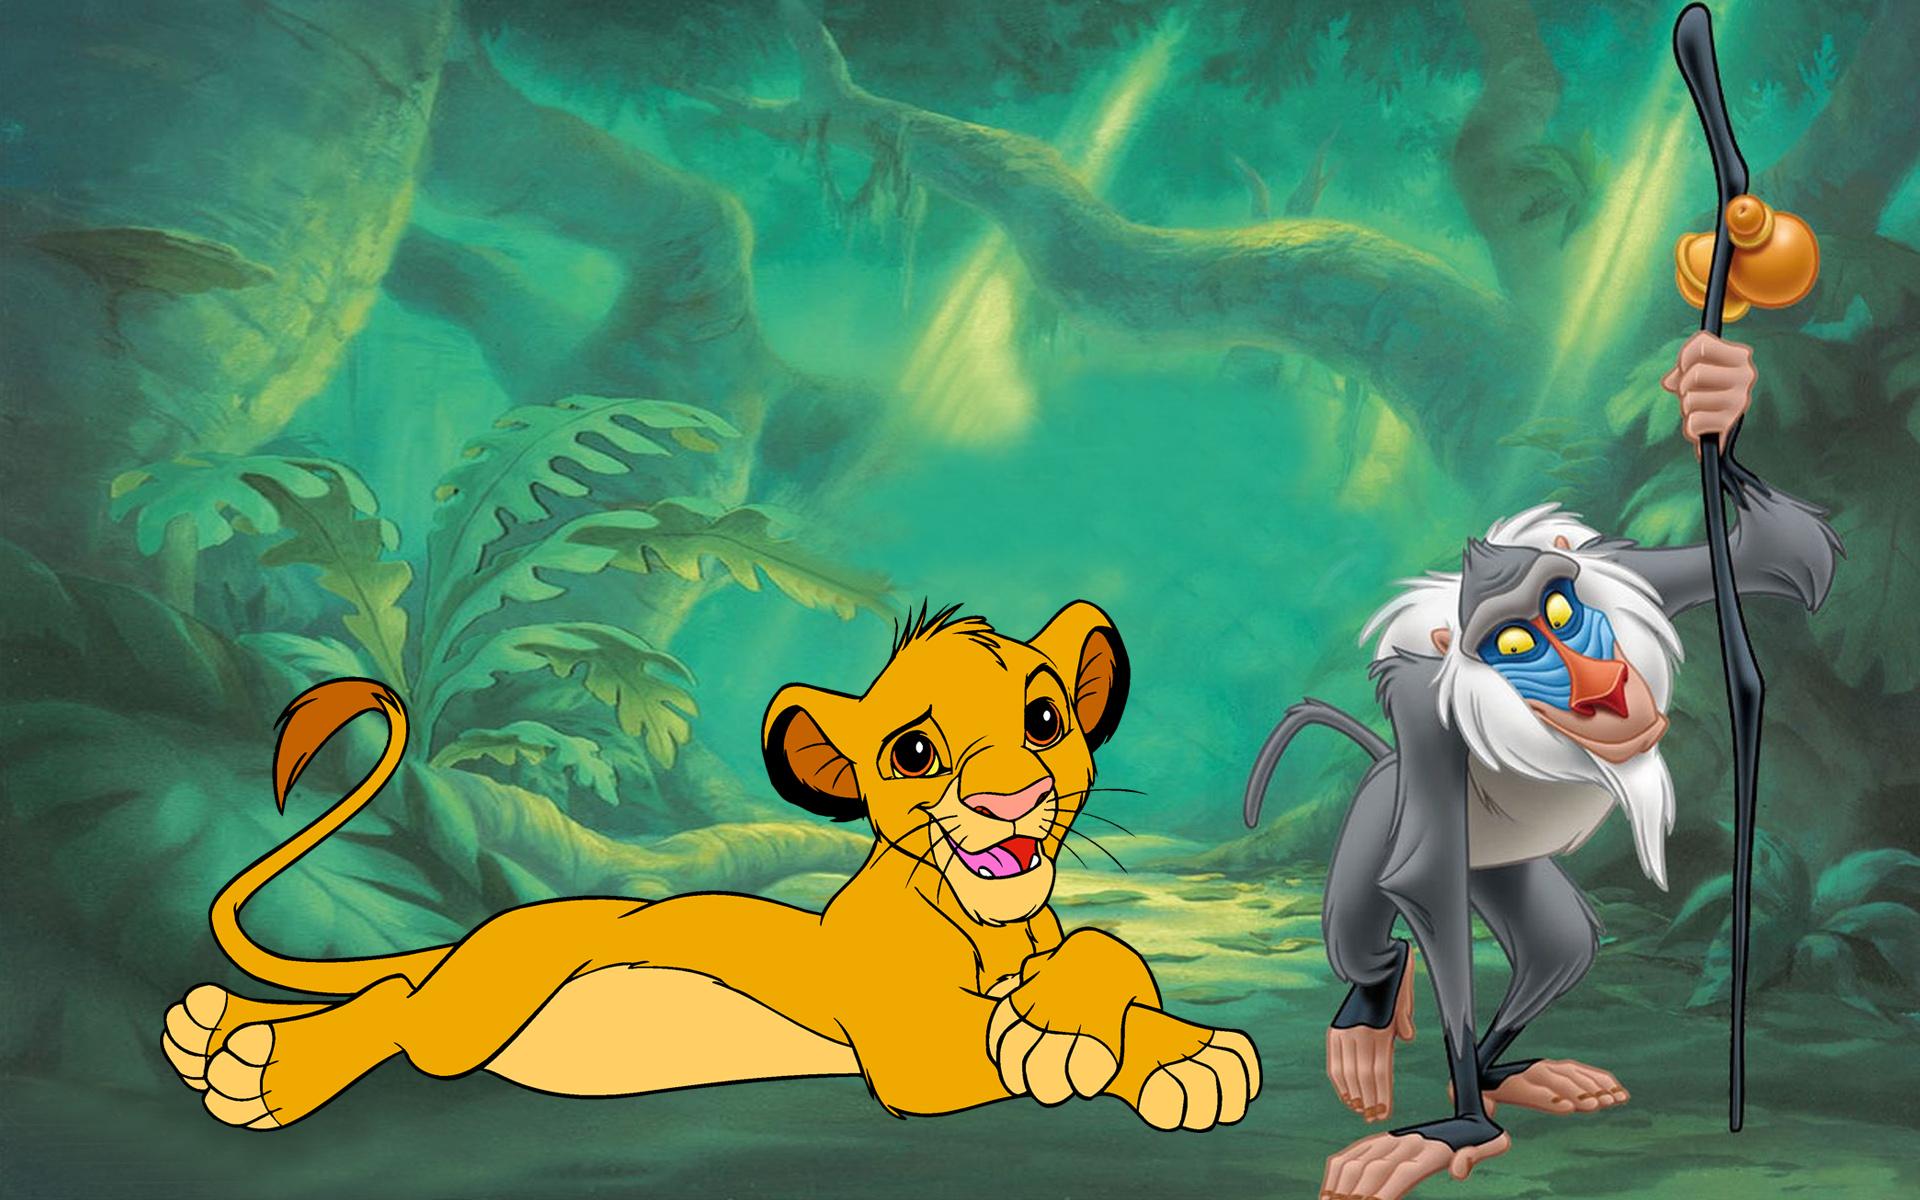 Hd Disney Cartoon Wallpapers The Lion King Simba And Rafiki Photo Hd Wallpaper